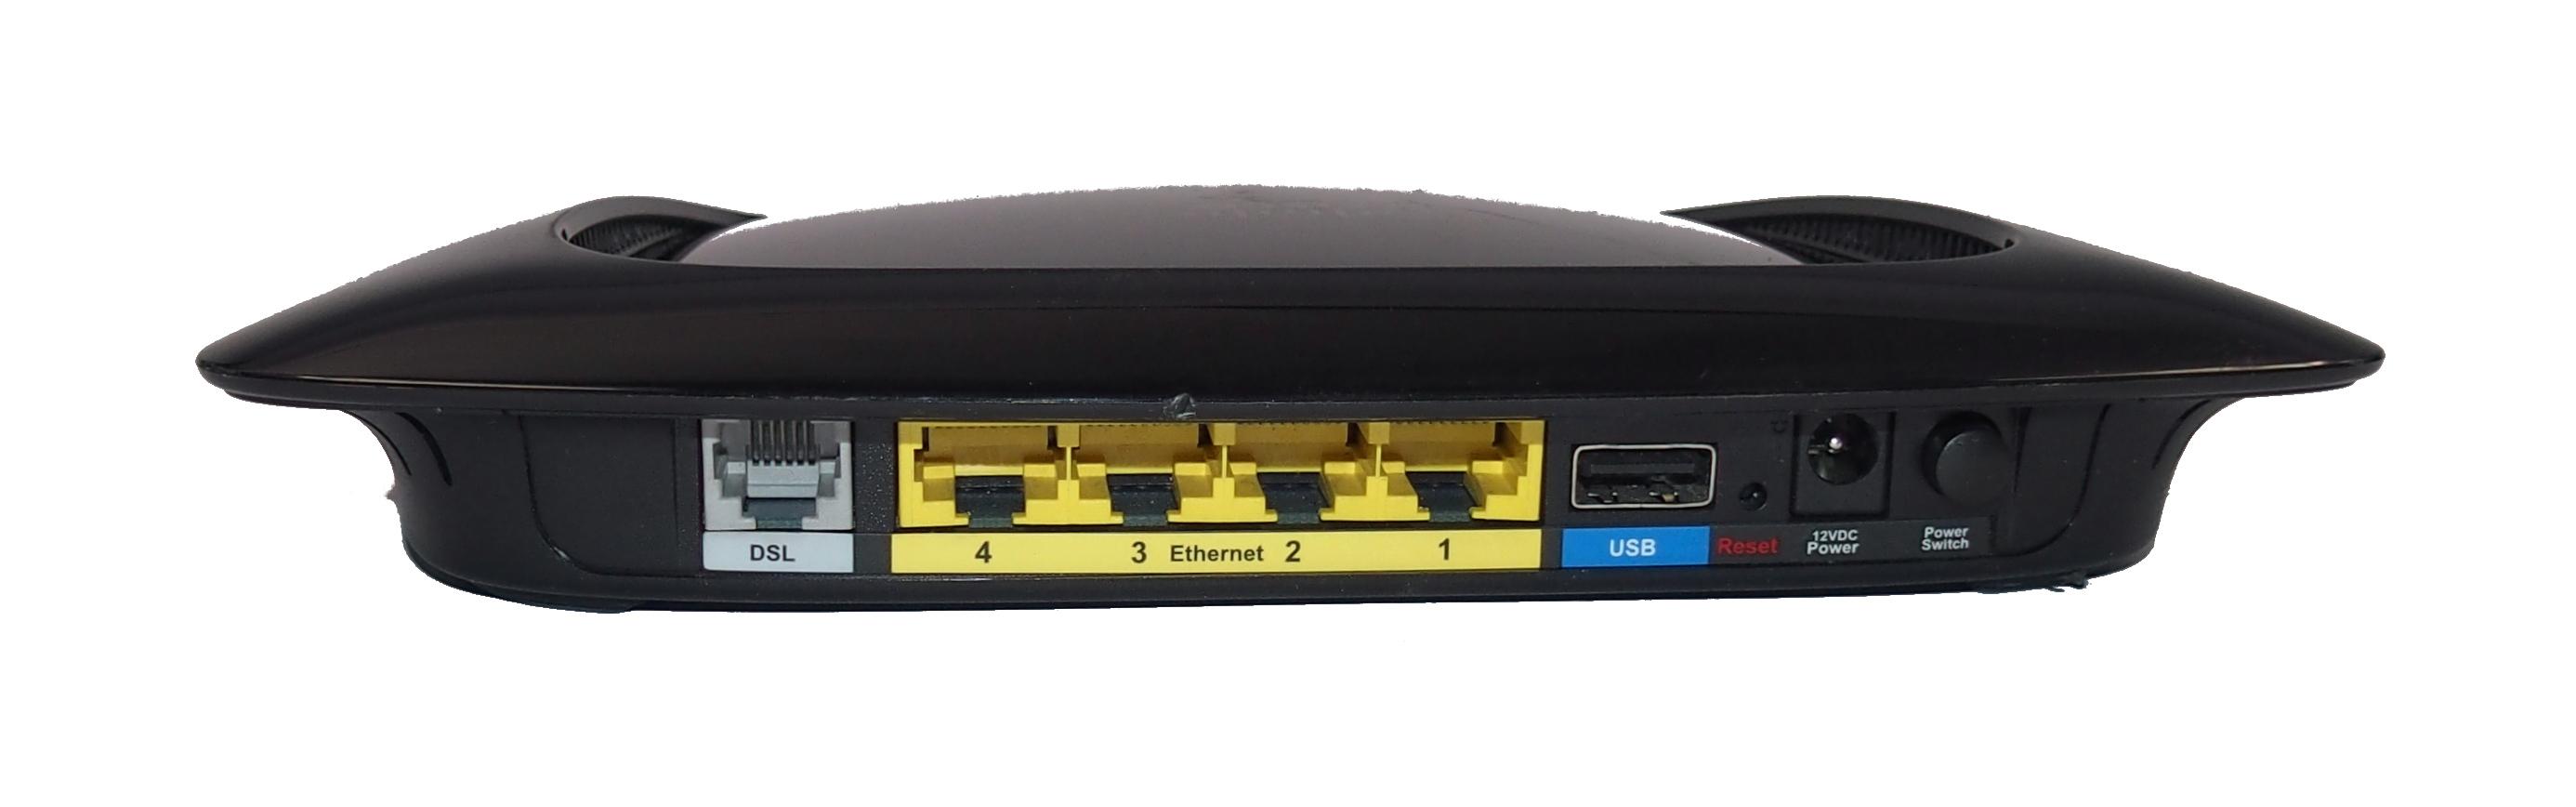 Cisco linksys Dual band wireless n Ethernet Bridge manual